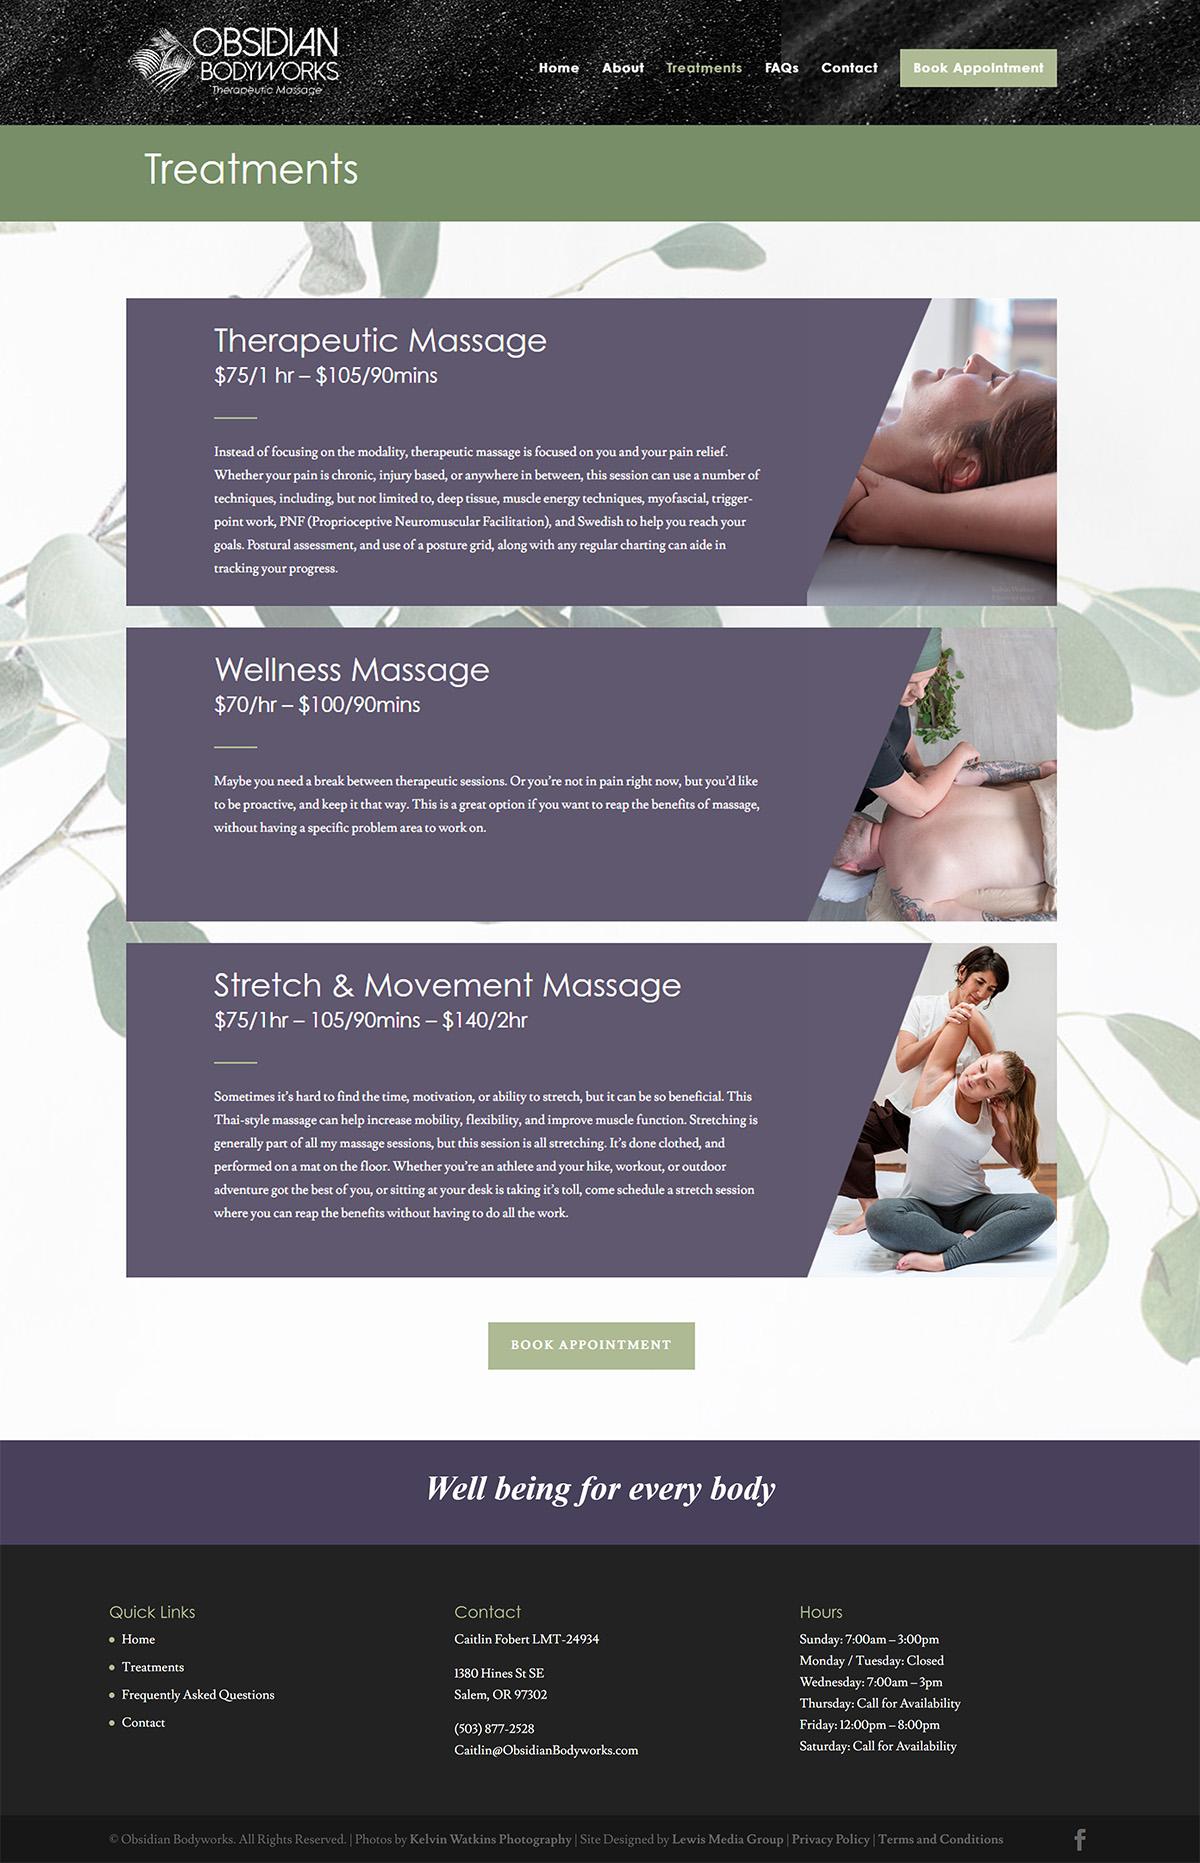 Screenshot of Obsidian Bodyworks treatments page